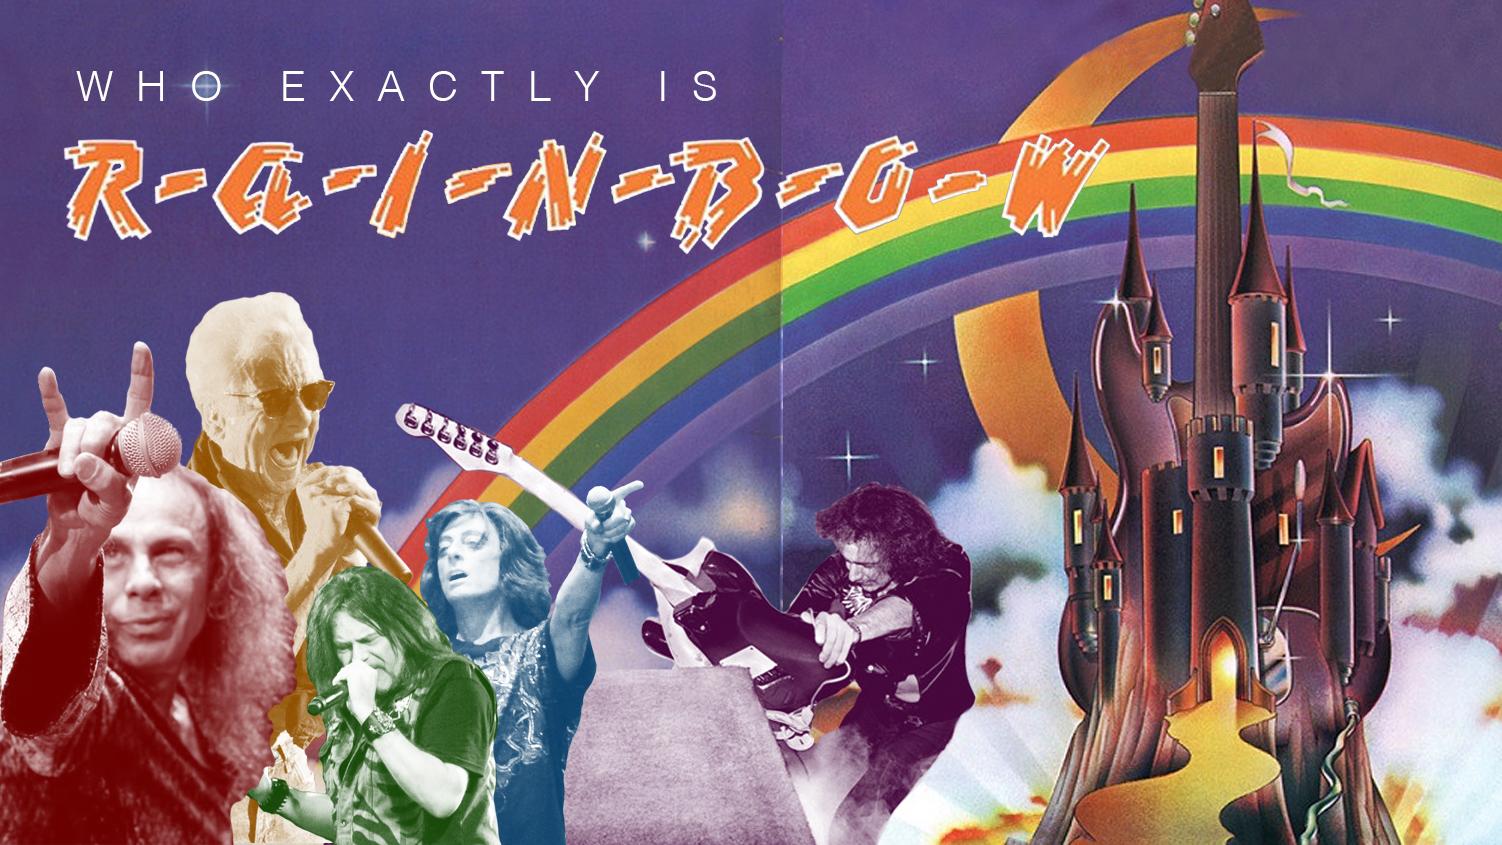 rainbow band debut album 45th anniversary